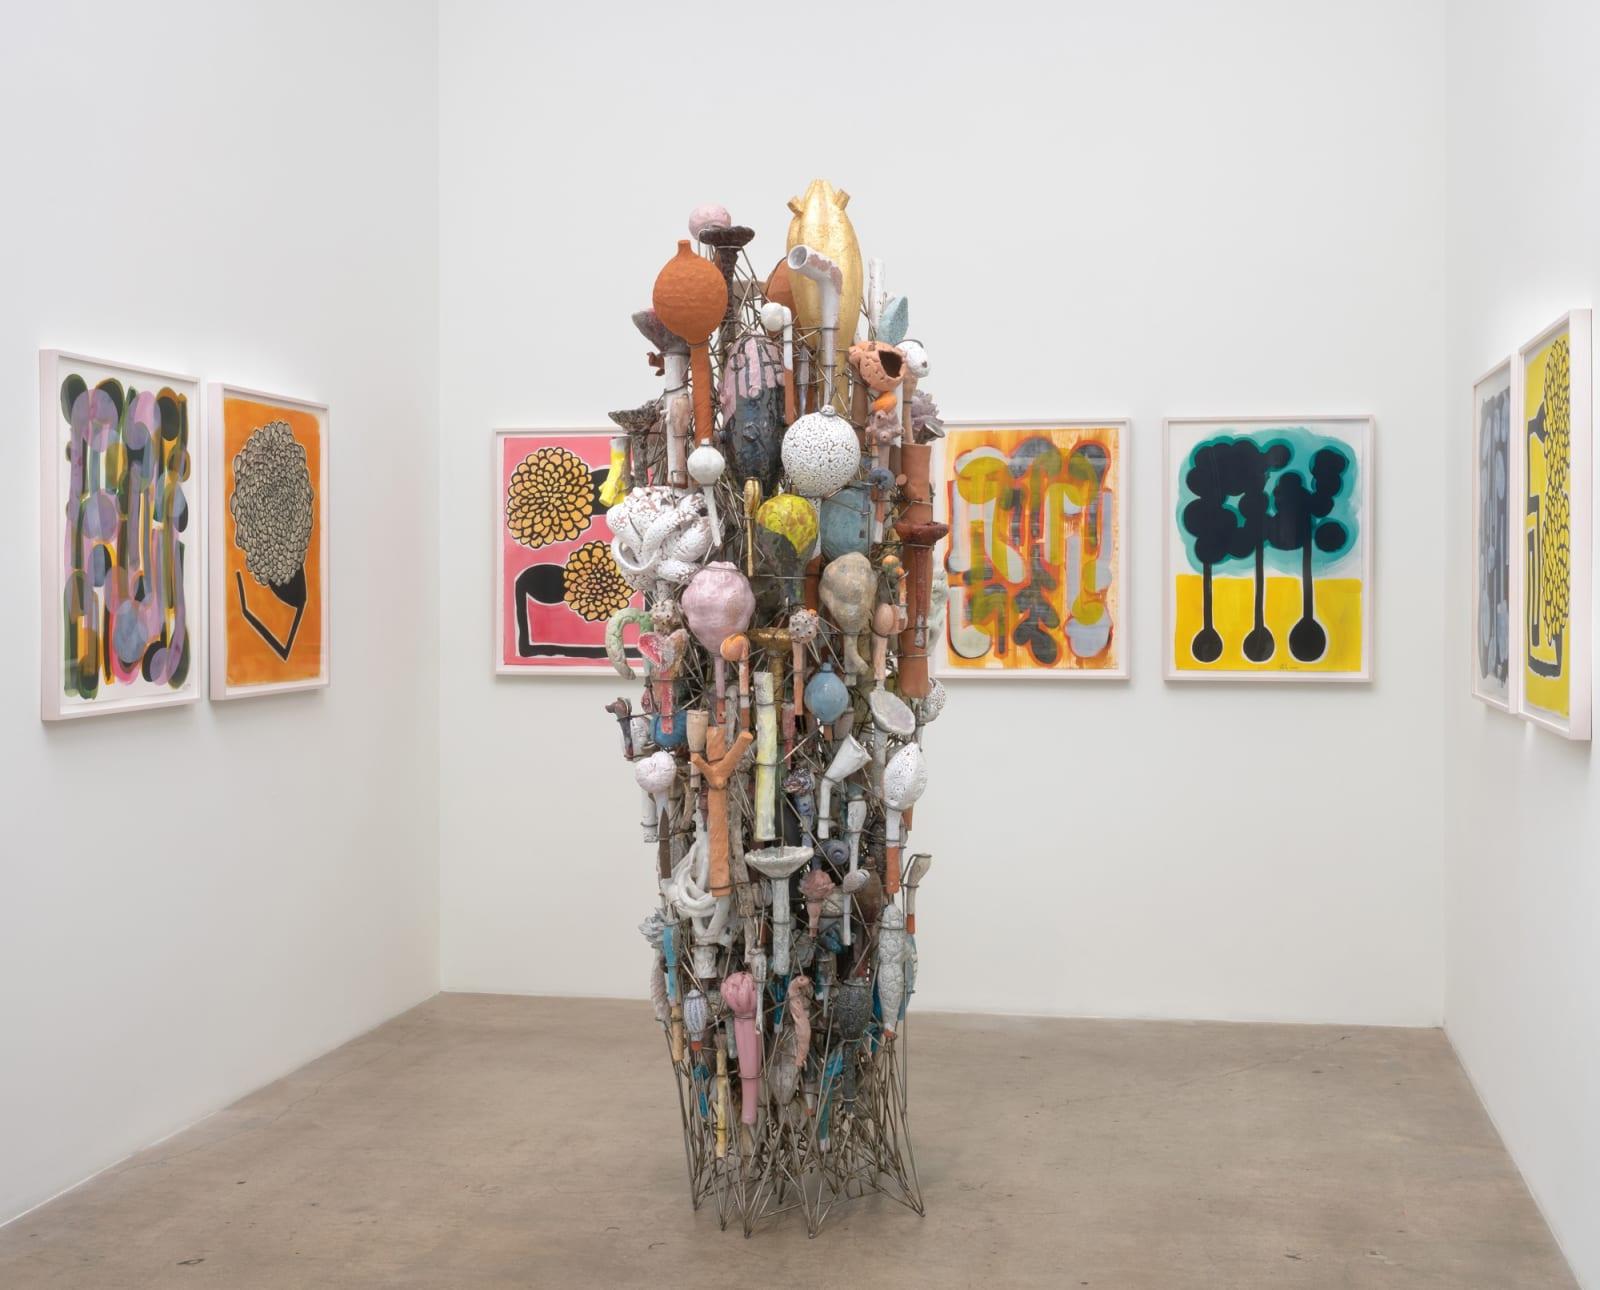 David Hicks: Seed